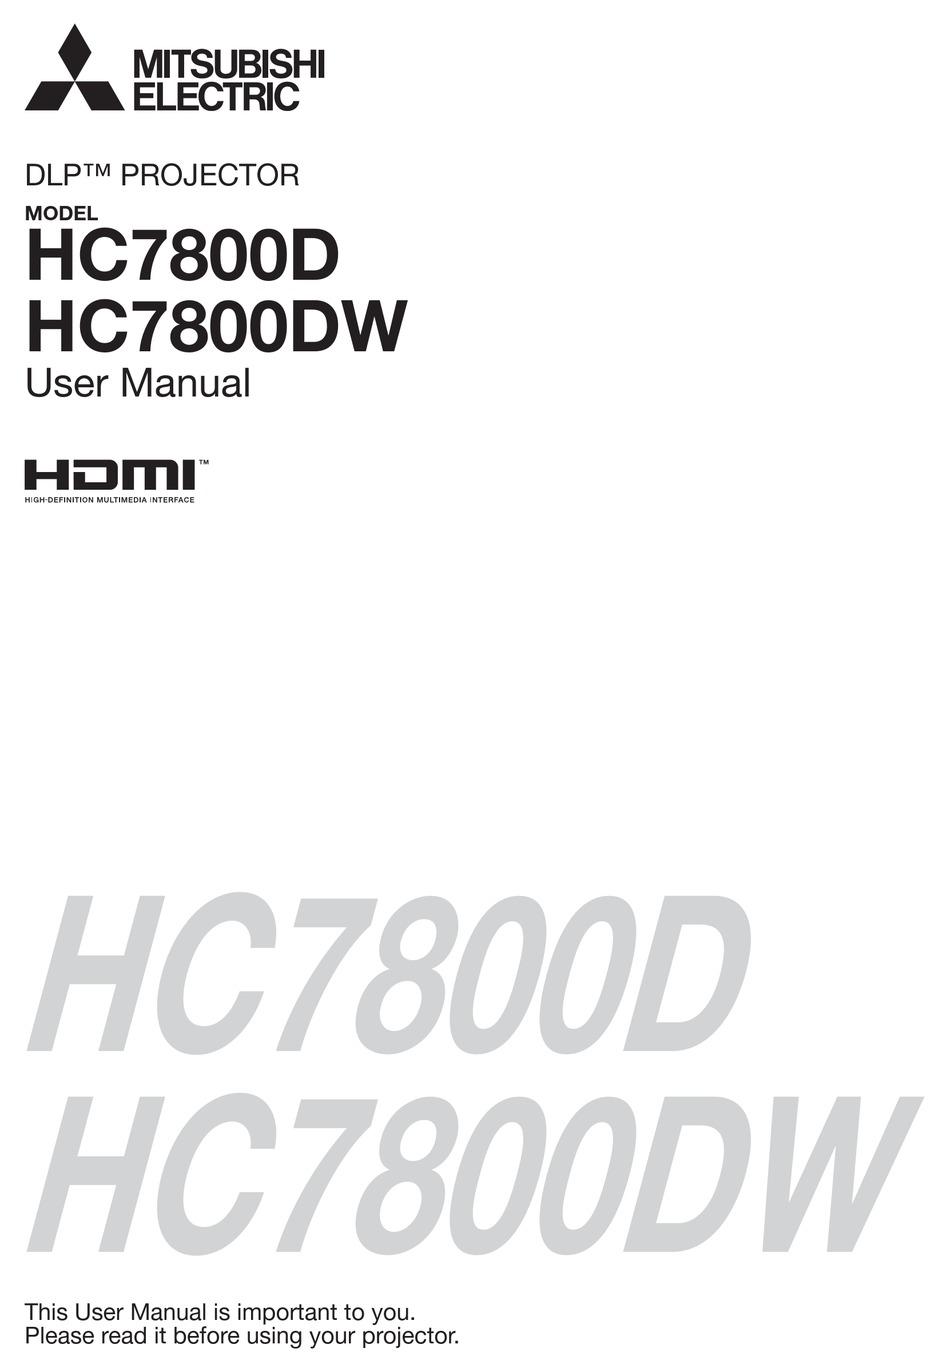 MITSUBISHI ELECTRIC DLP HC7800D USER MANUAL Pdf Download